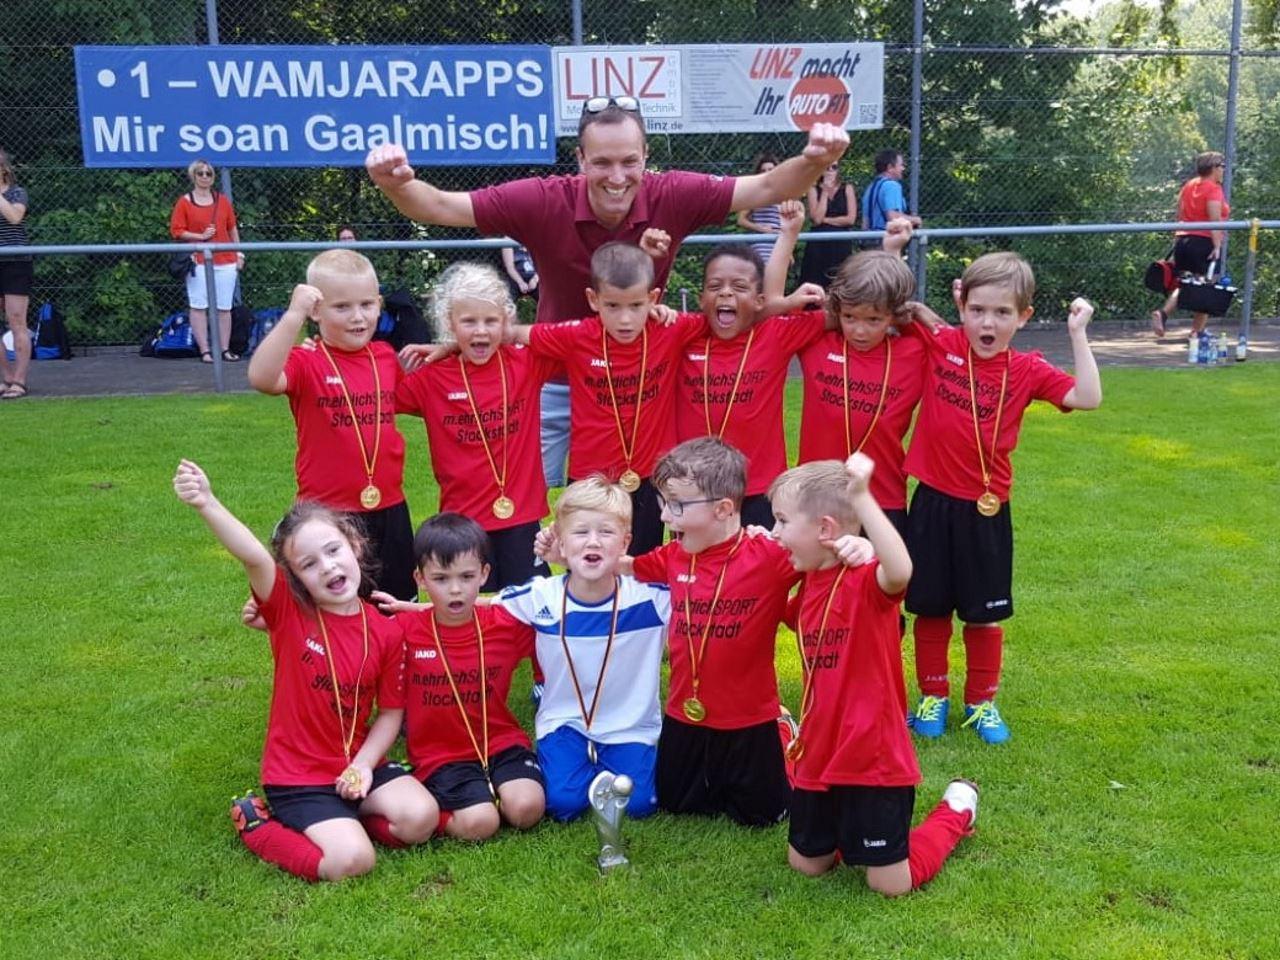 TV Schweinheim Fußballjugend beim Linz – Cup in Gailbach 2018